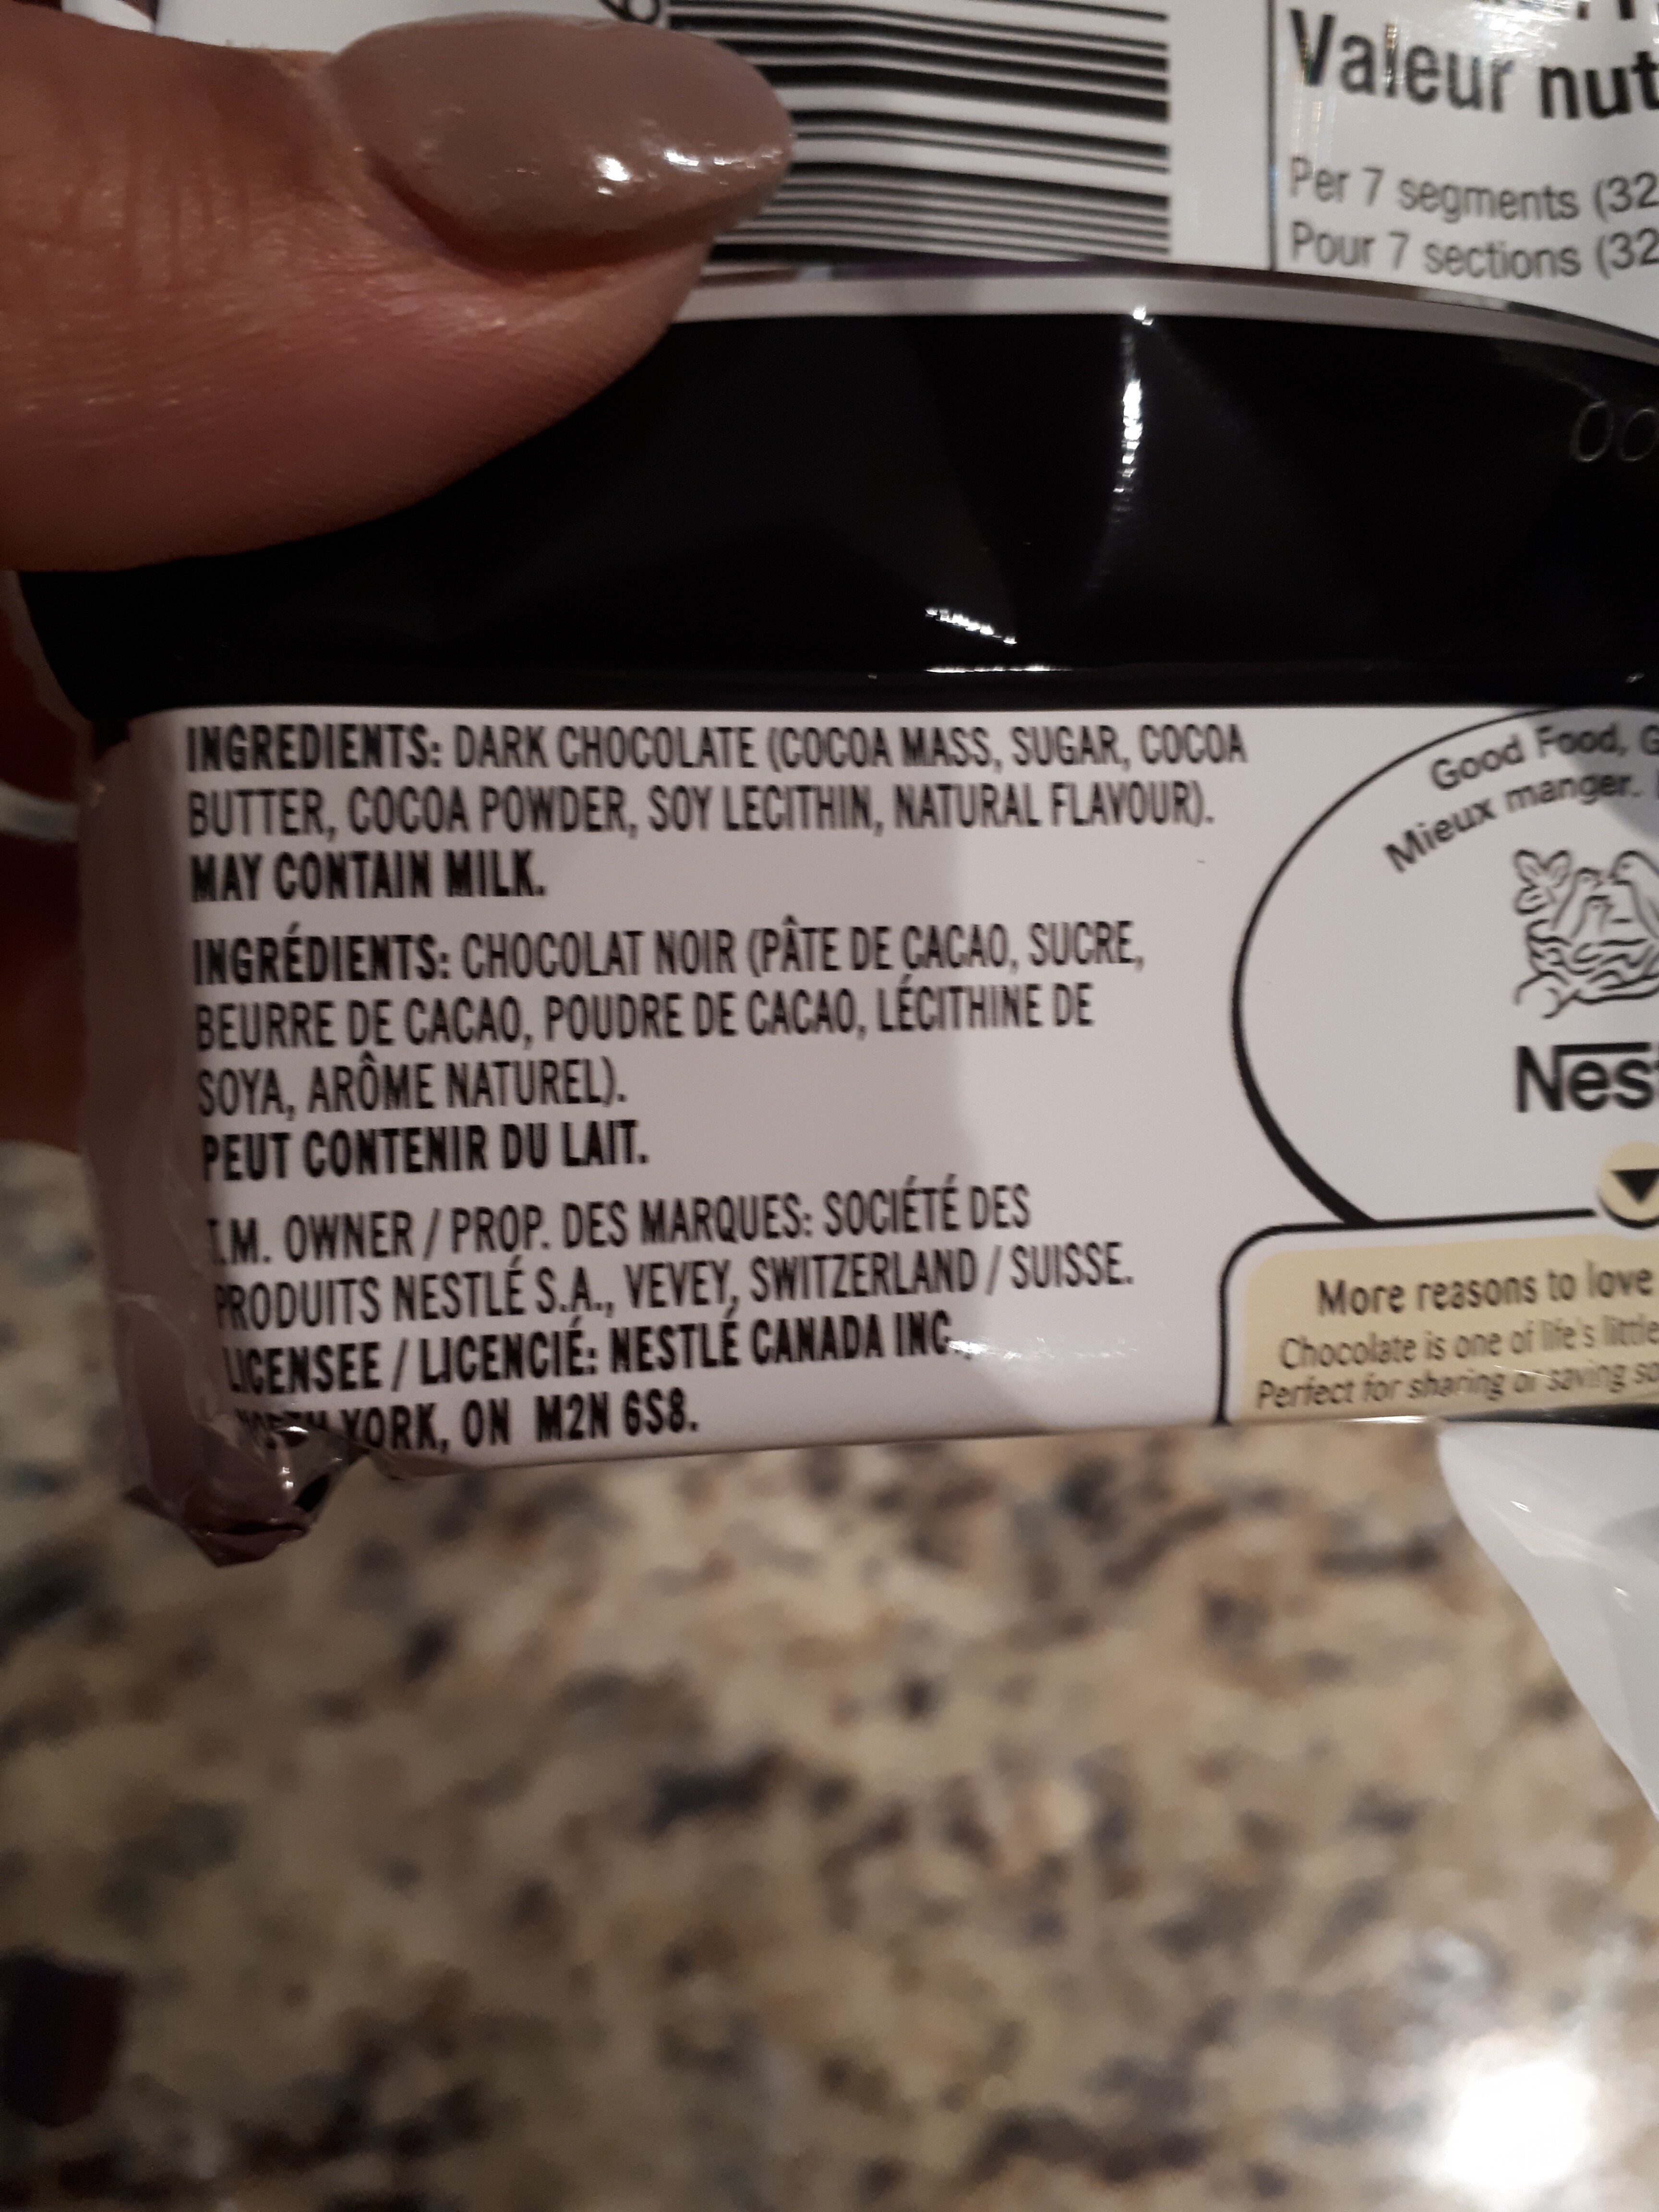 Aero chocolat noir 70% - Ingredients - en